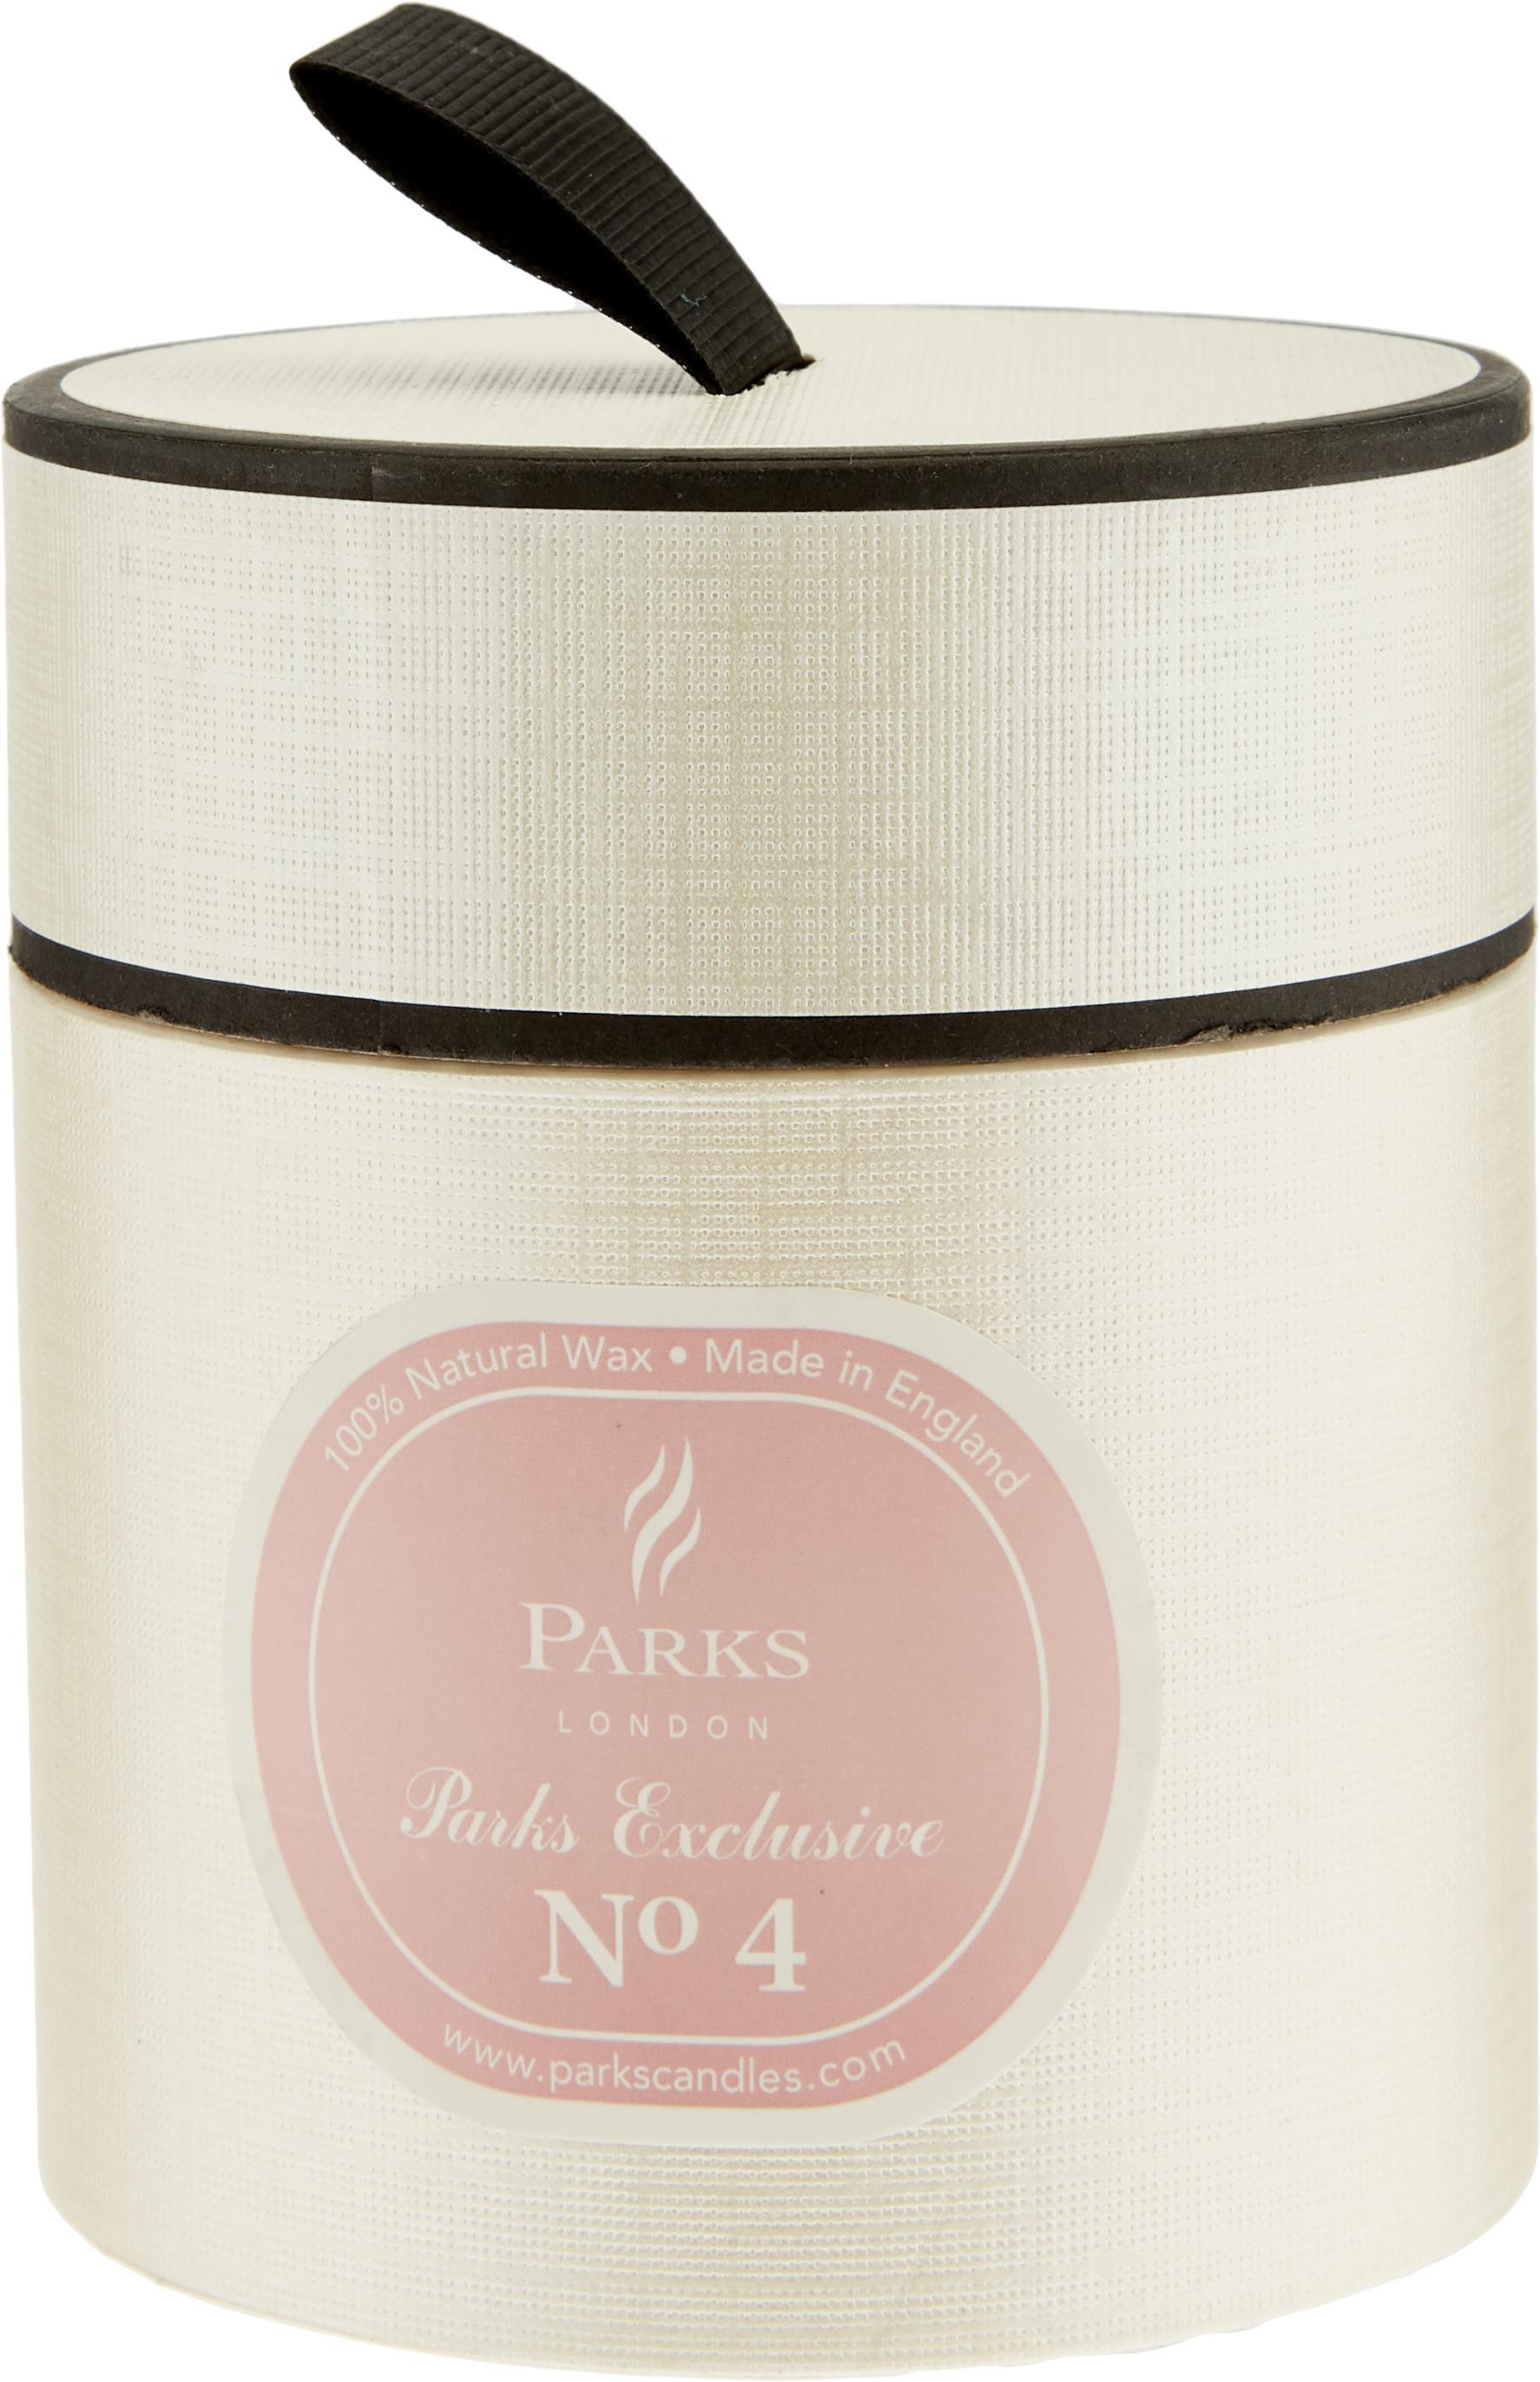 Geurkaars Exclusive No 4 (passiebloem & vanille), Houder: melkglas, Transparant, wit, zalmkleurig, Ø 8 x H 9 cm